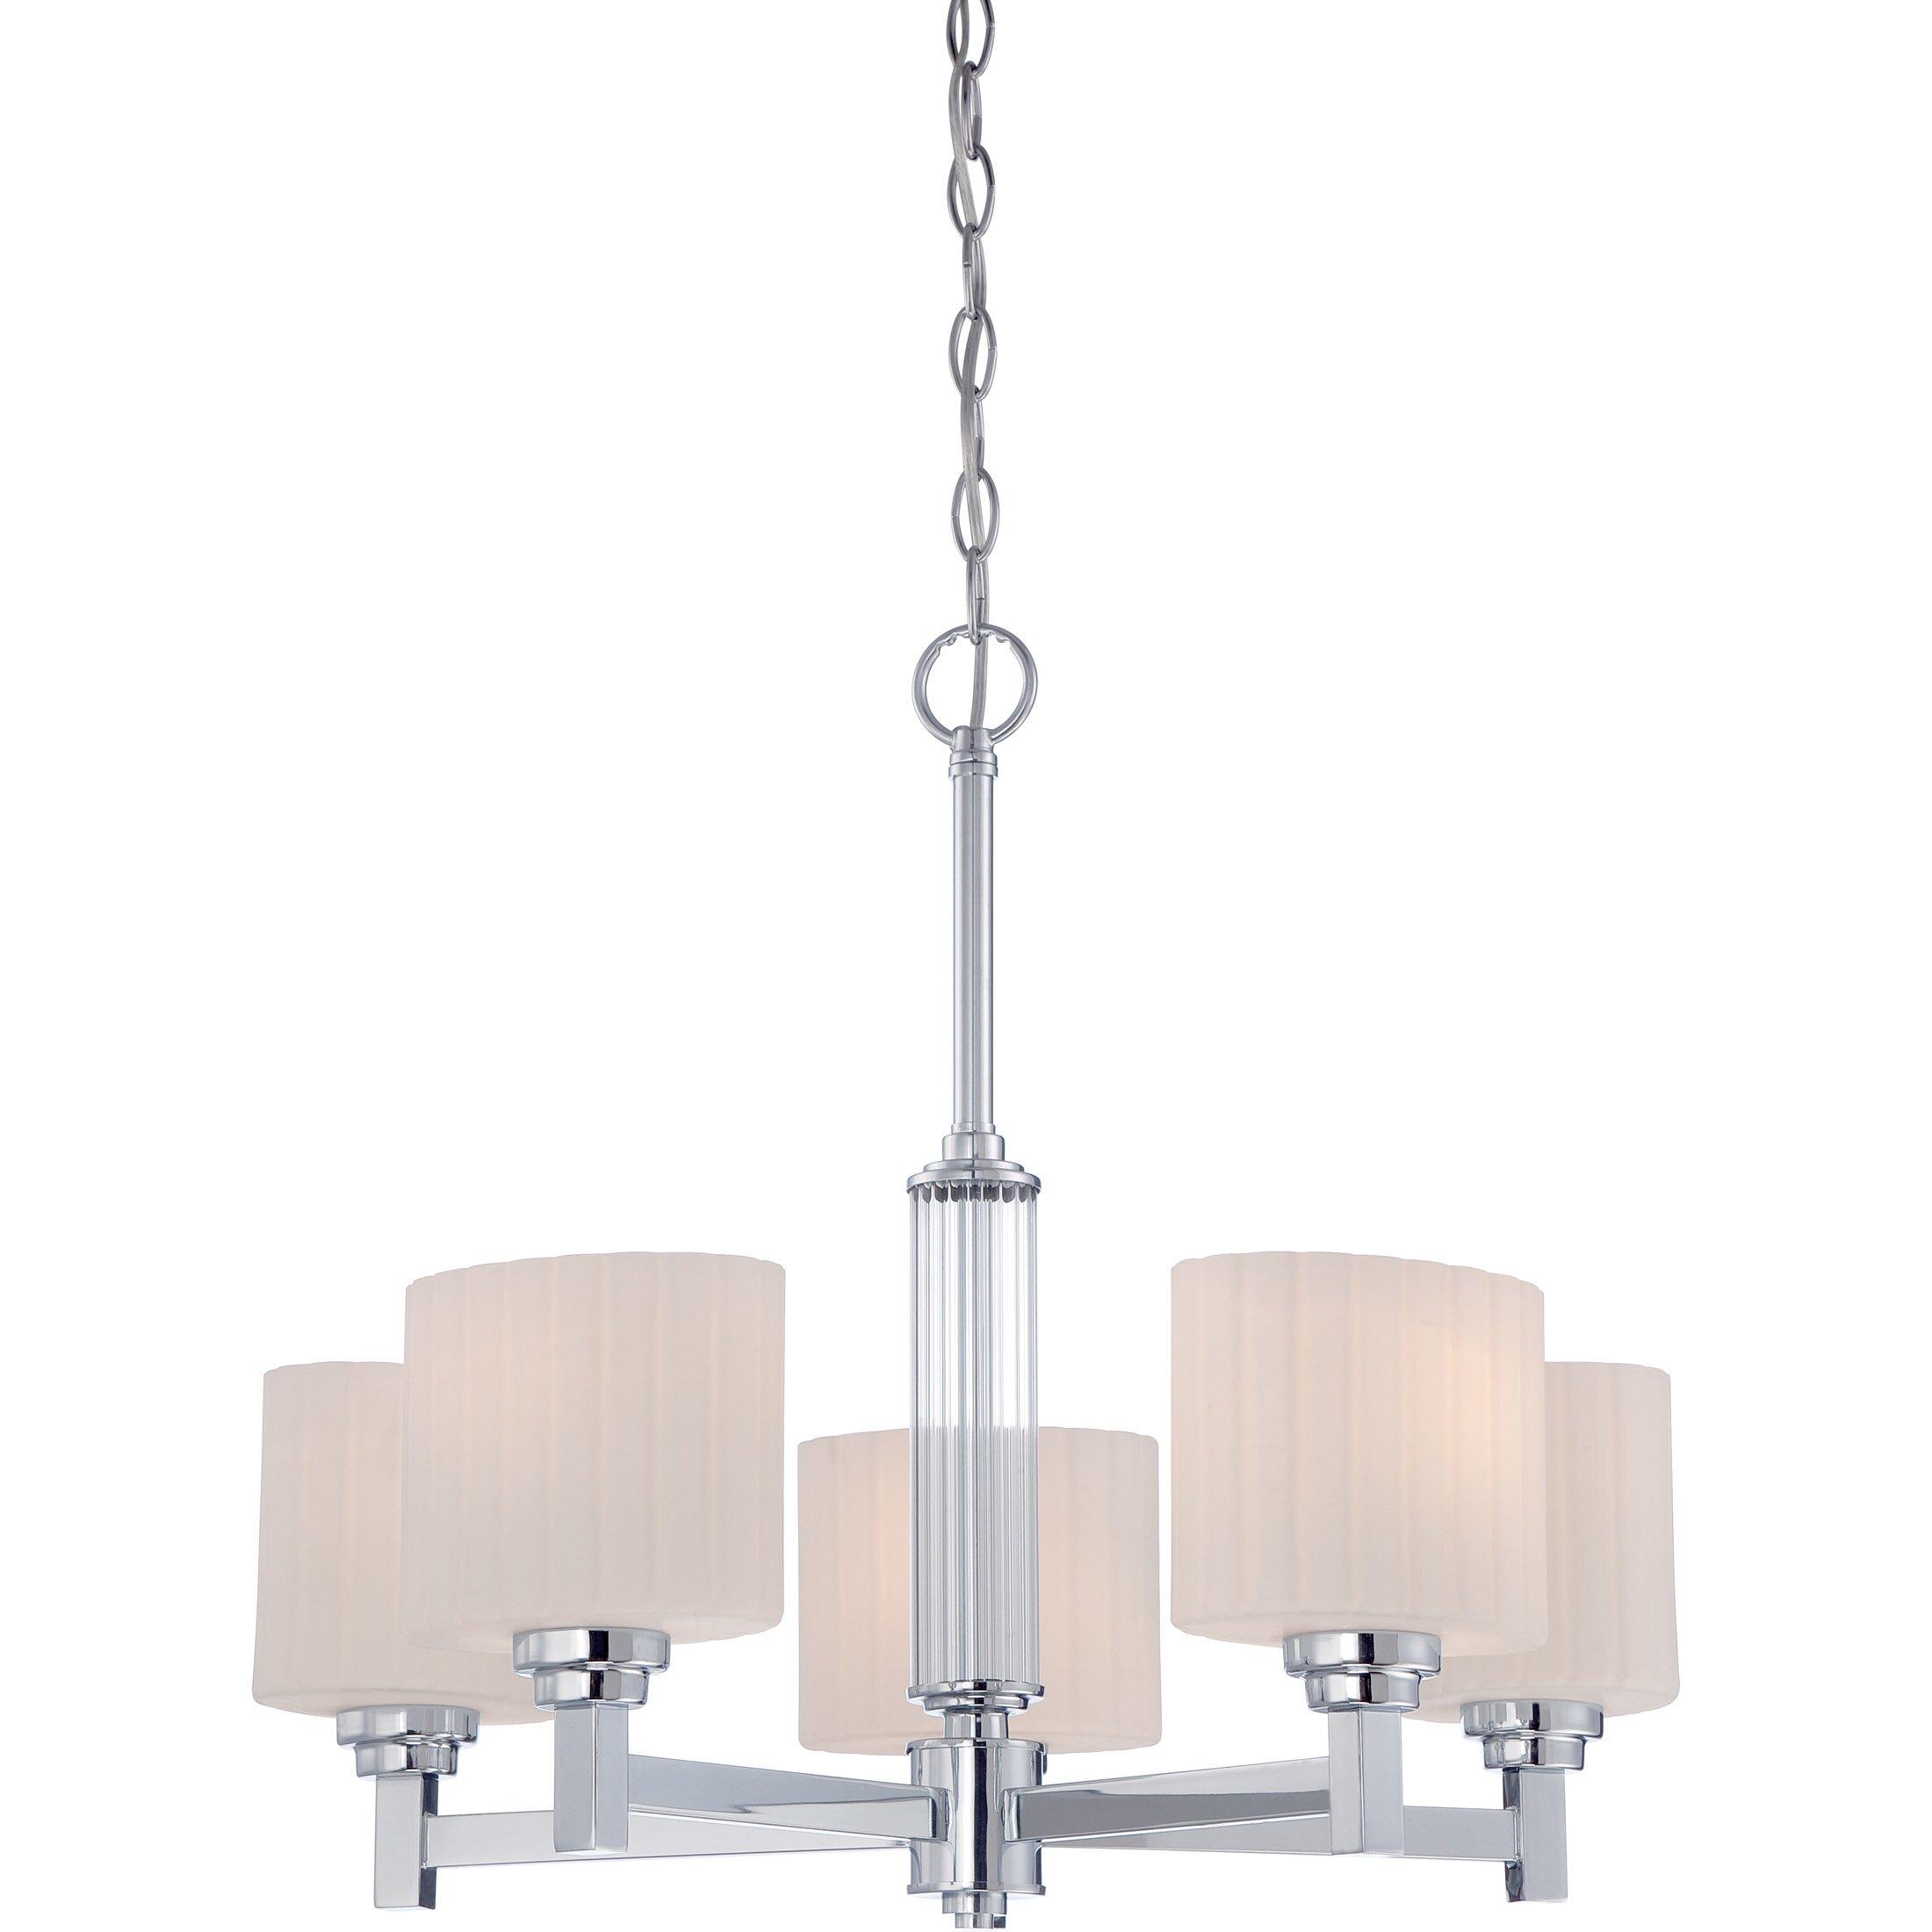 Chandeliers lighting direct : Illumina direct liam light chandelier reviews wayfair